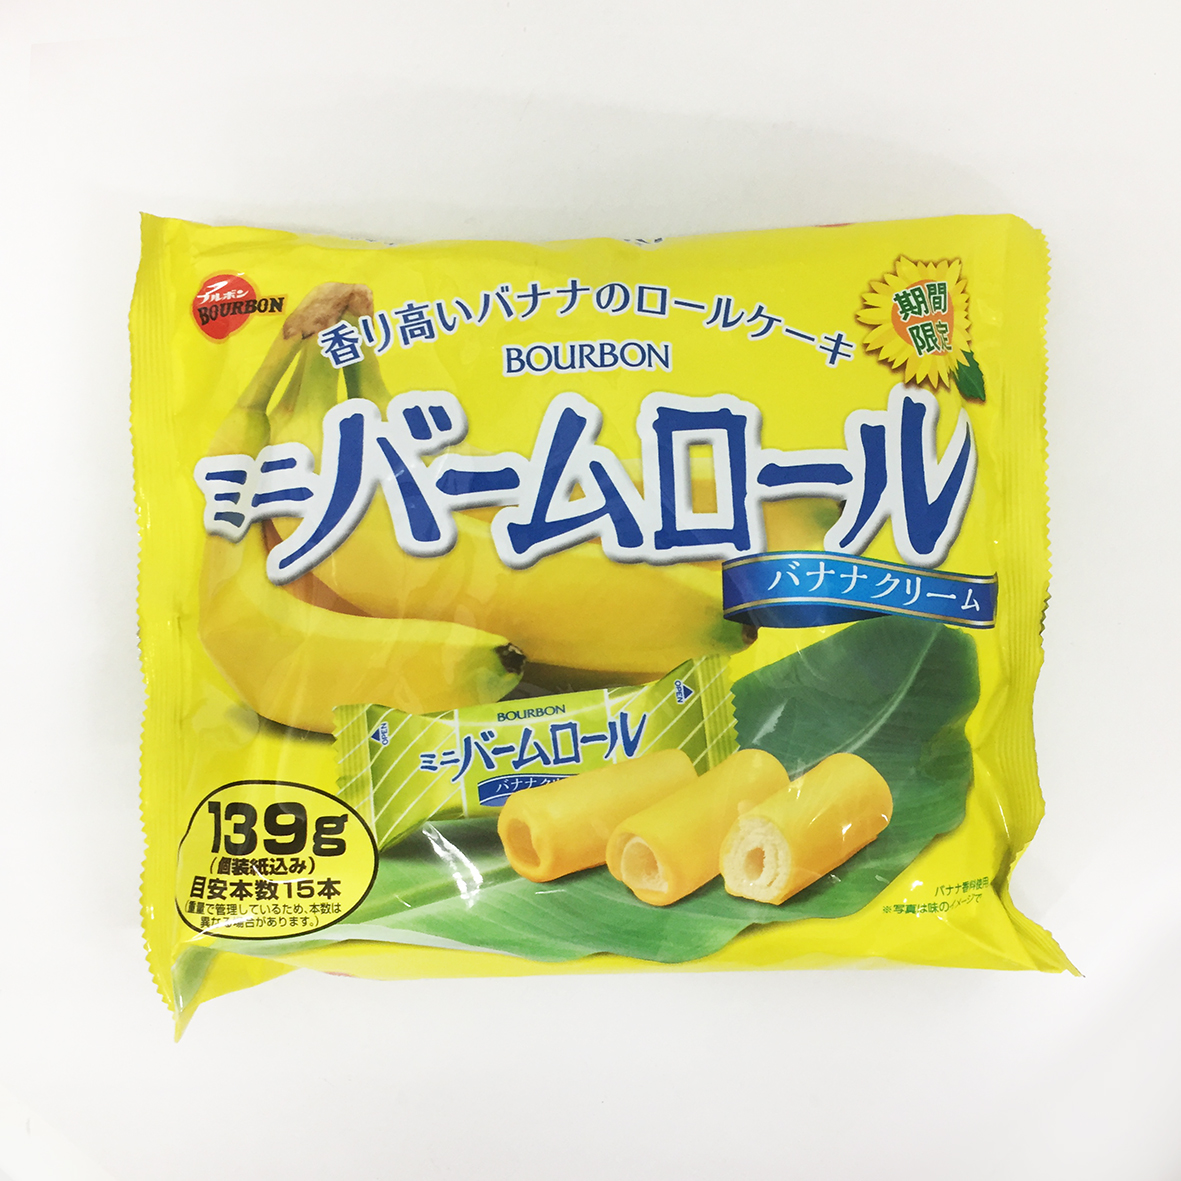 北日本Bourbon 檸檬蛋糕捲 139g